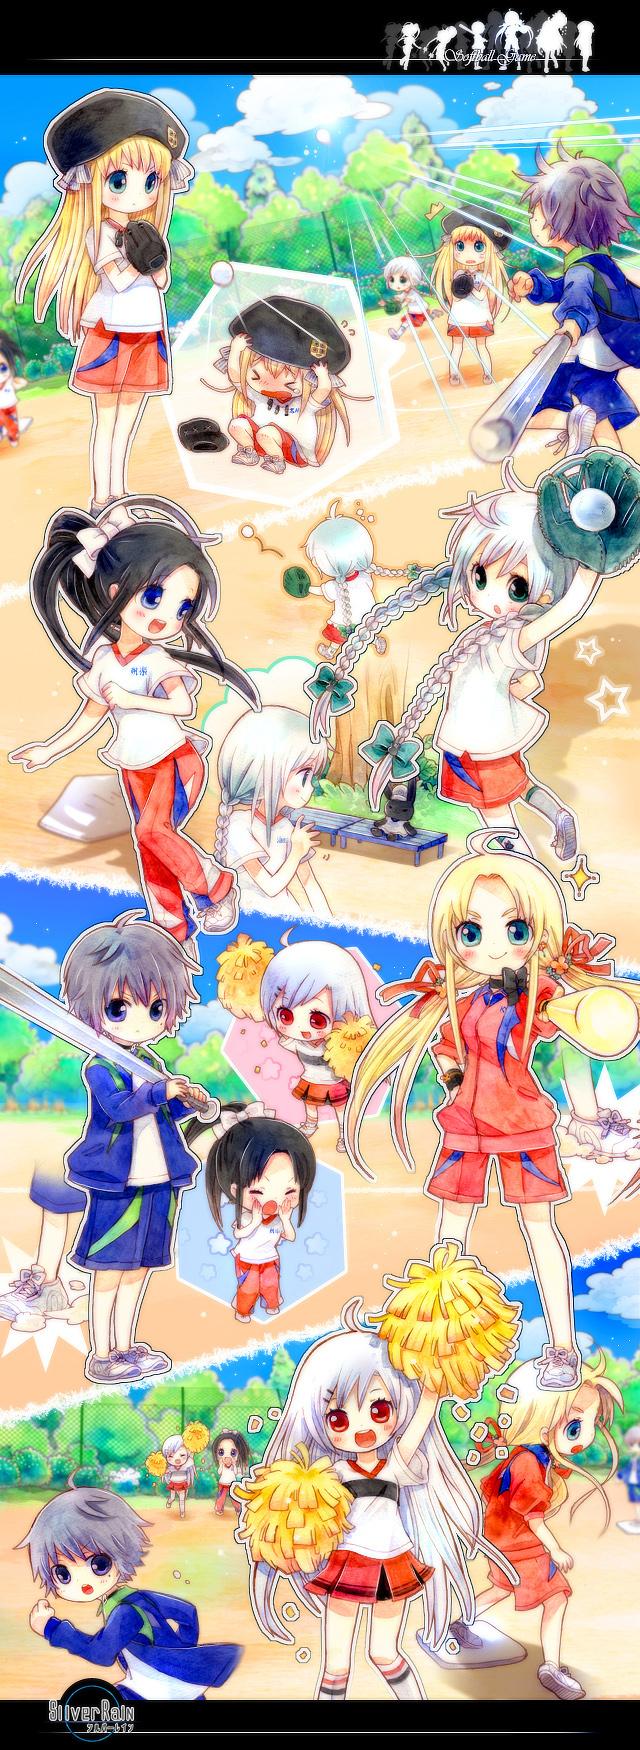 Tags: Anime, Silver Rain, Kokujiyou Aya, Souryu Aina, Elerey Silverstone, Sakura Hiyori, Azumi Sola, Freia Kursiu, Baseball